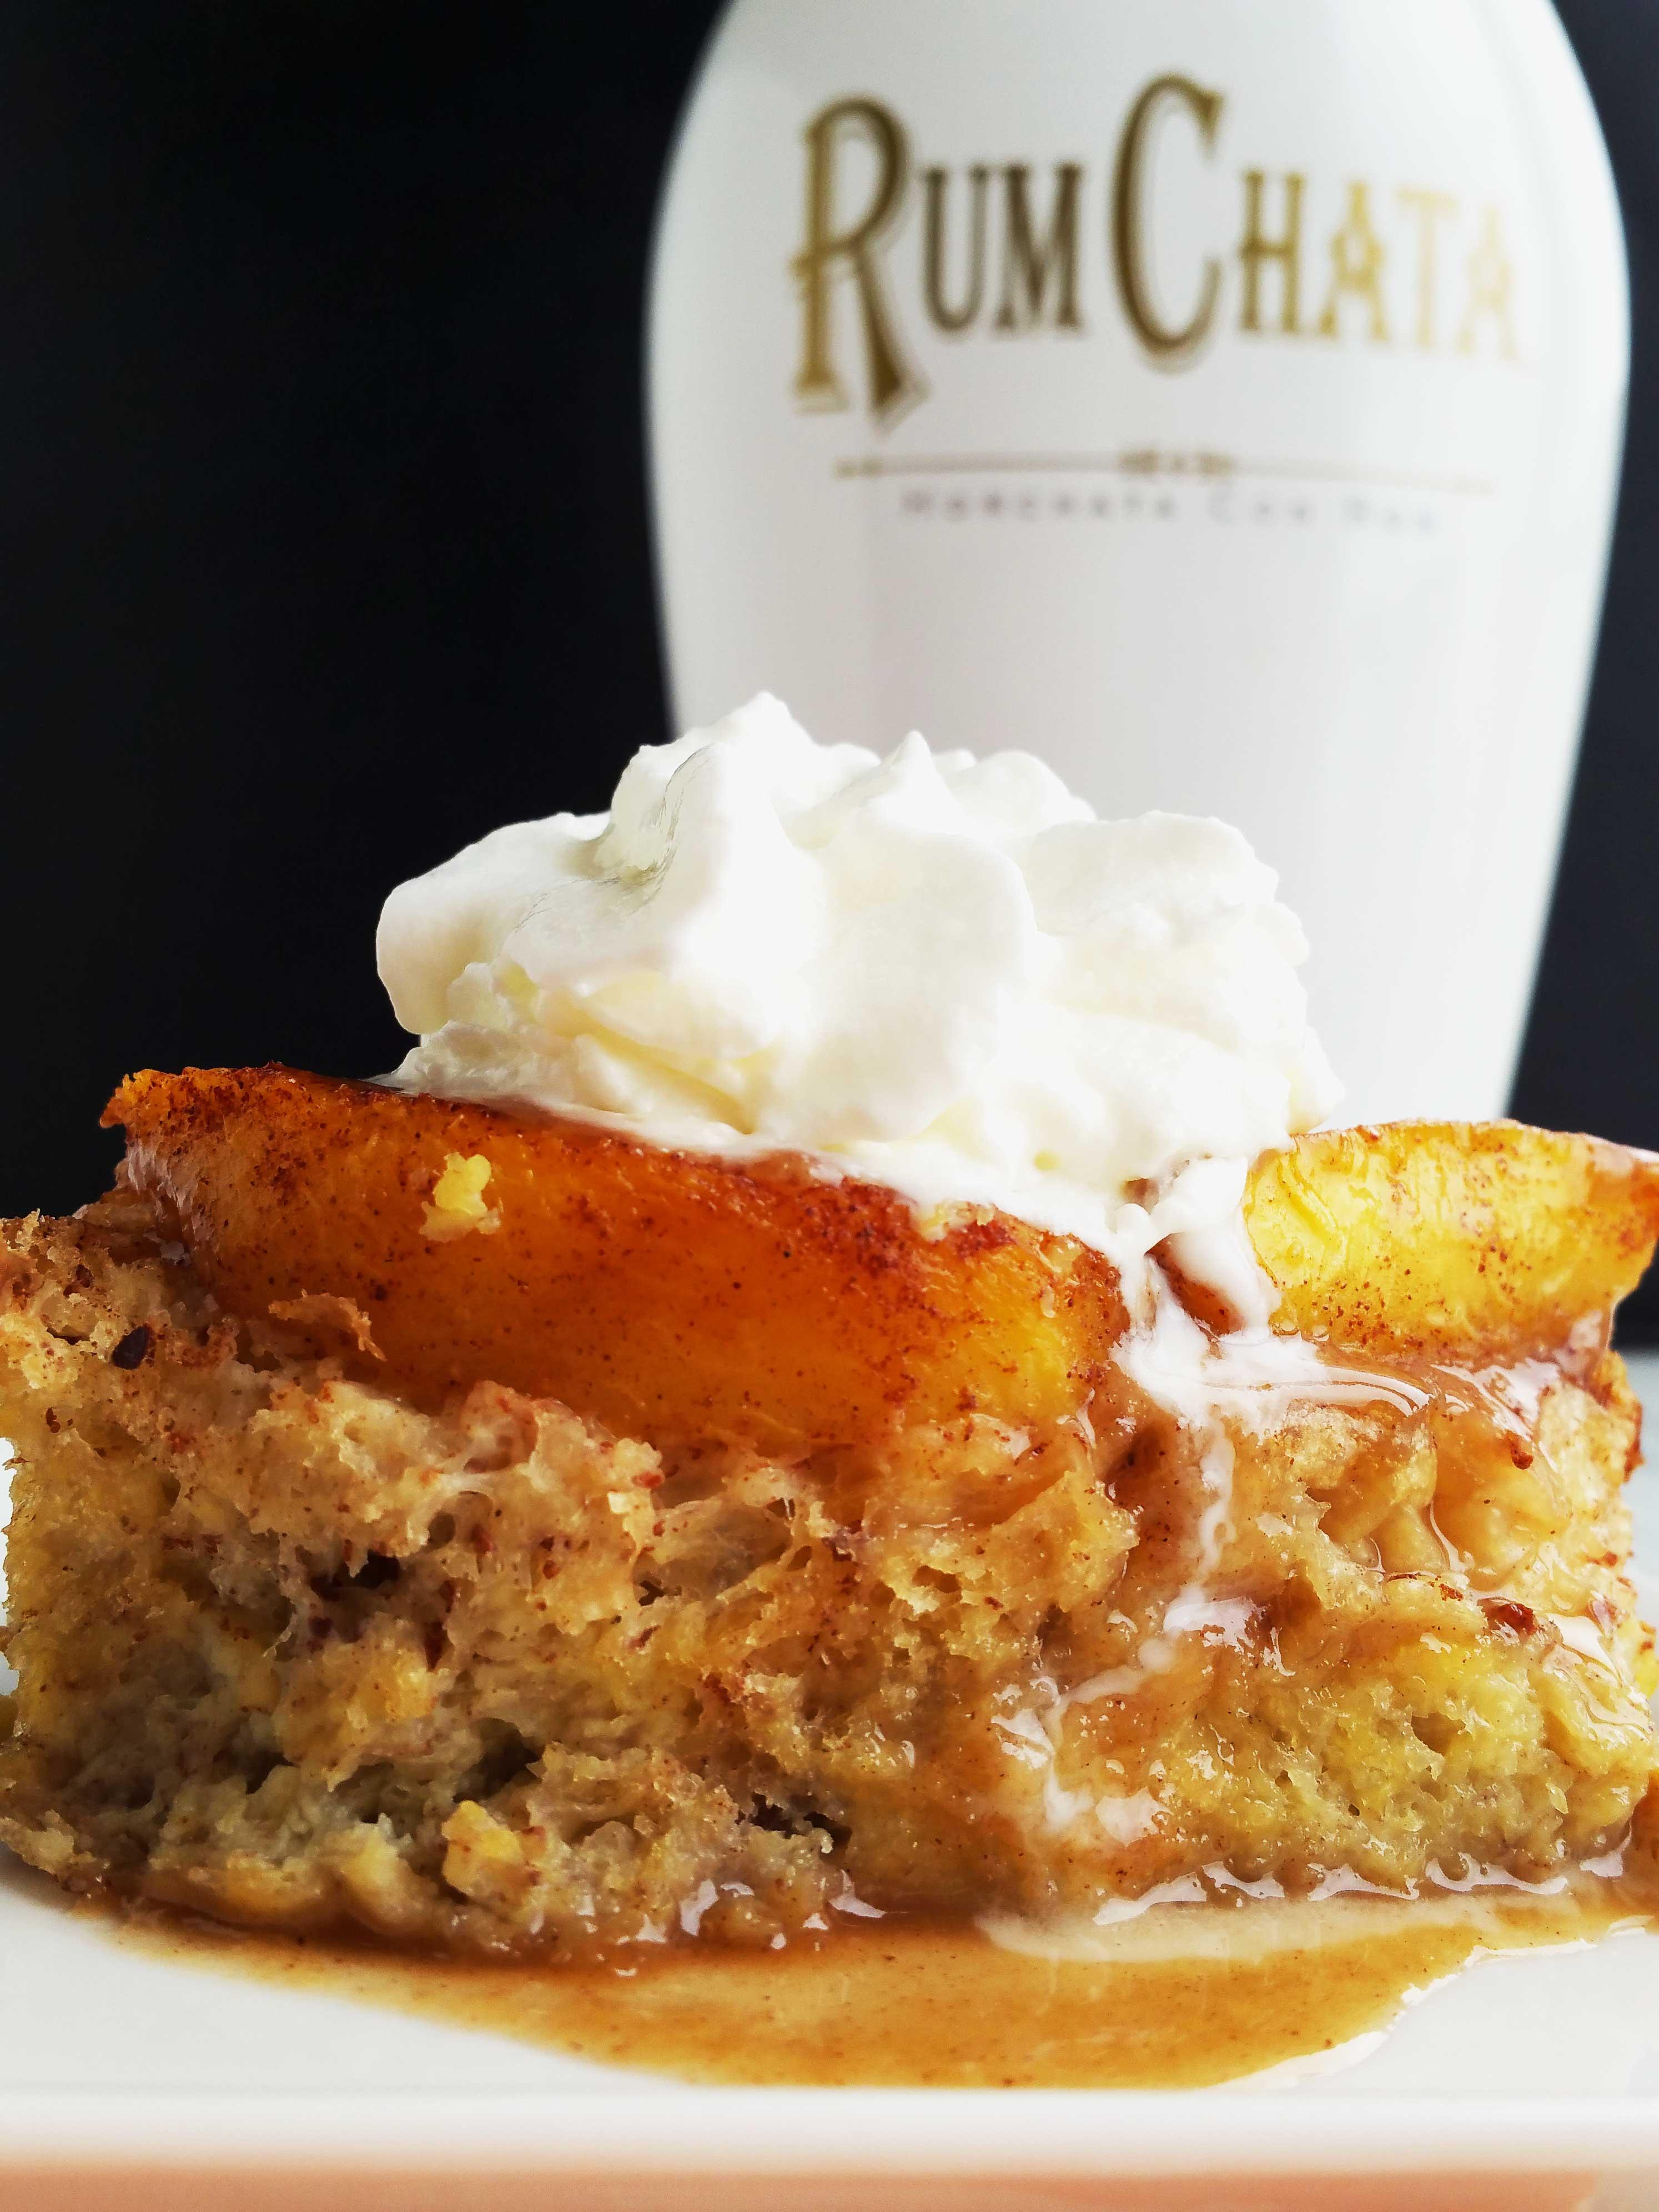 Rum Chata Peach French Toast